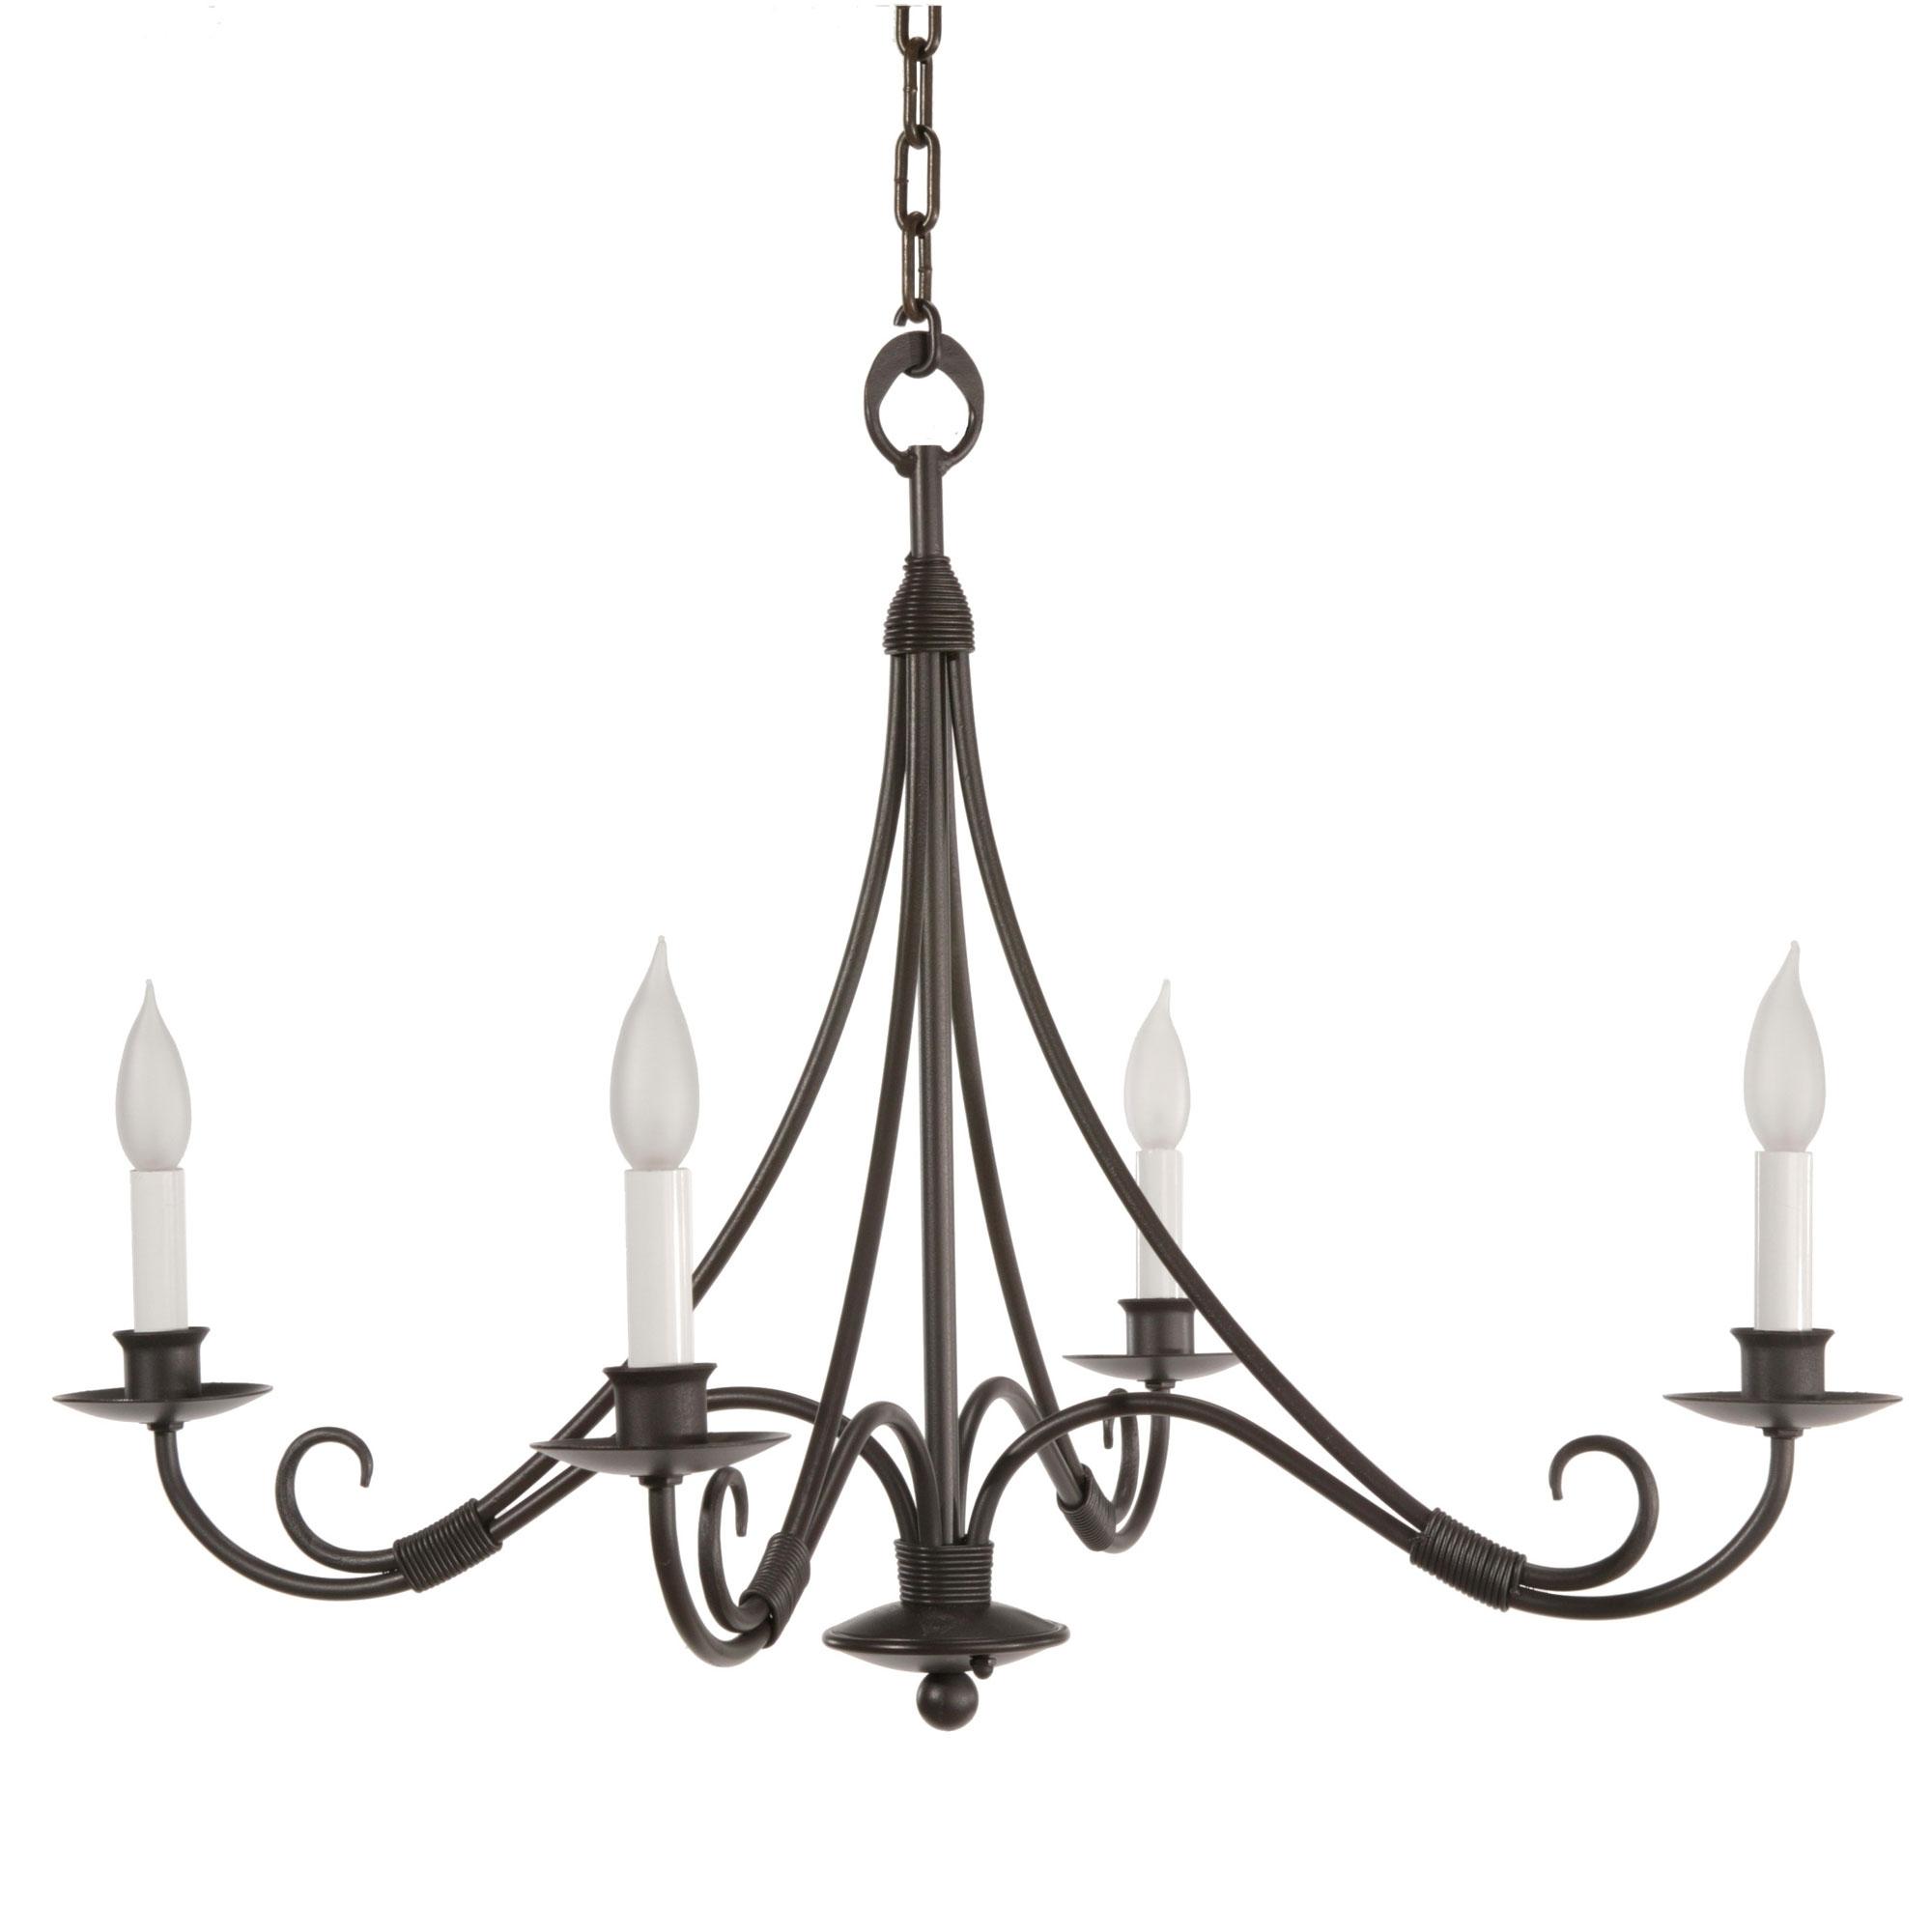 Chandeliers Design : Wonderful Black Iron Chandelier Bedroom Lights In Fashionable Black Iron Chandeliers (View 12 of 20)